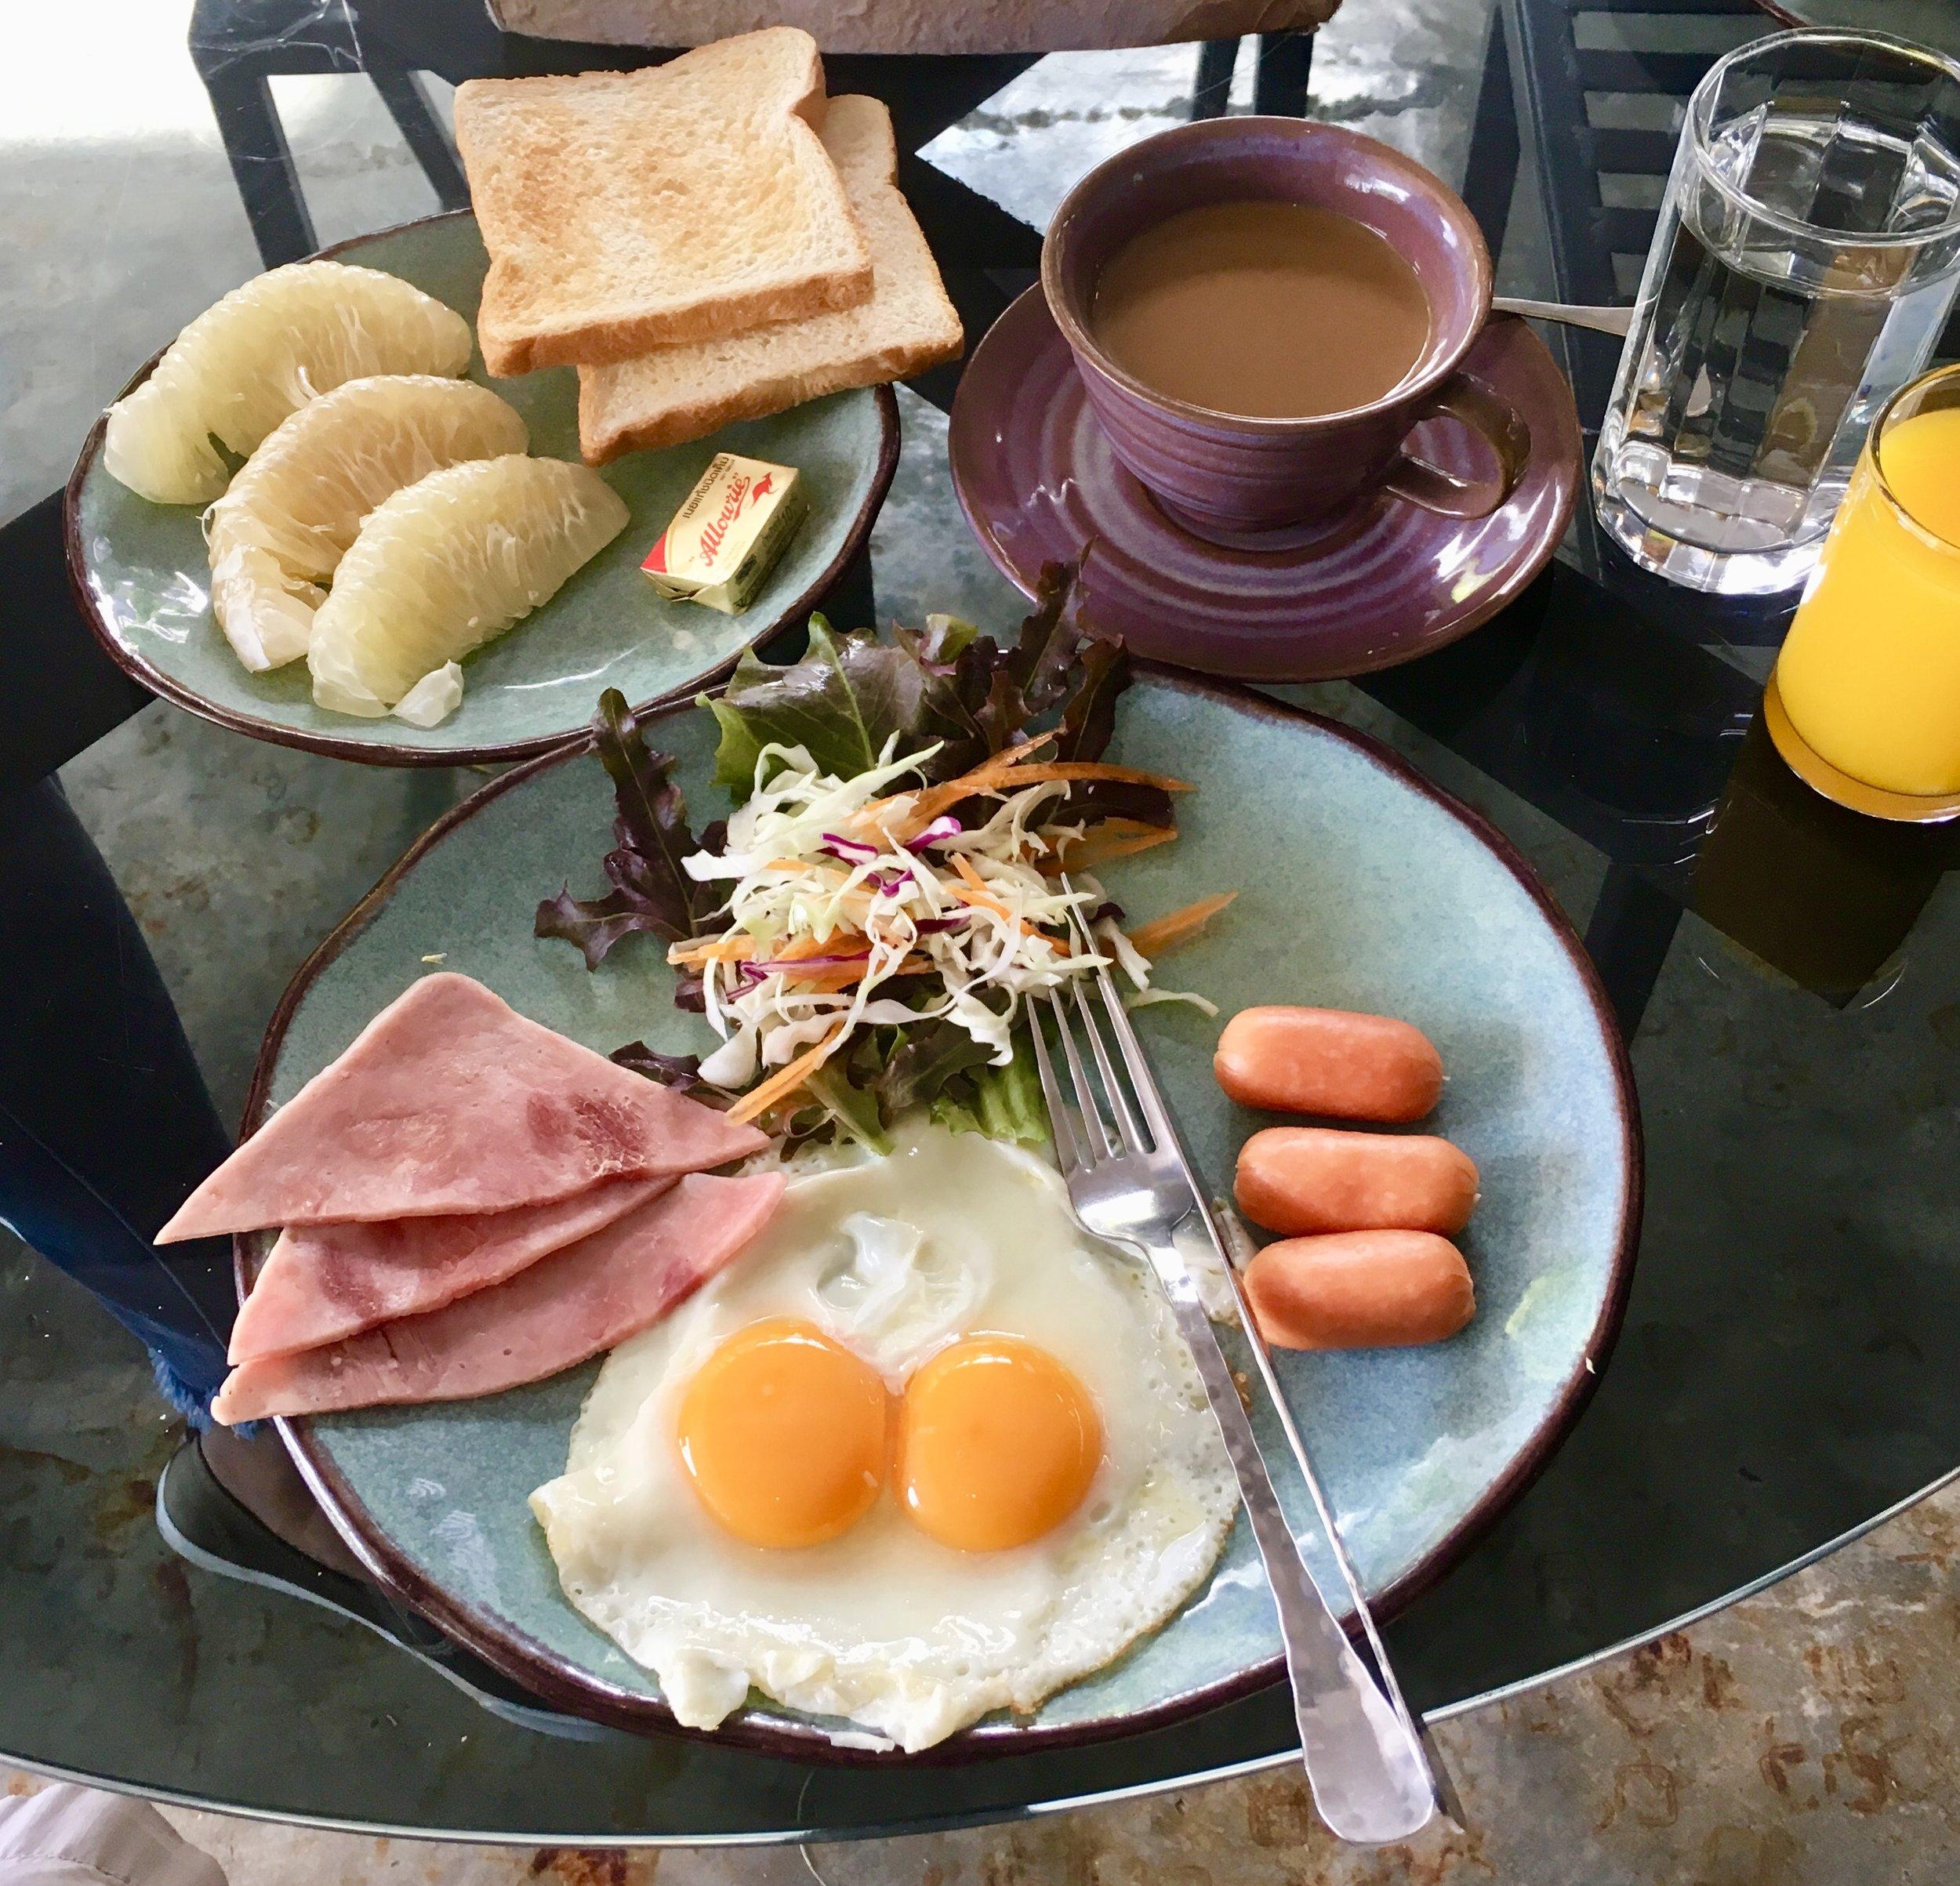 "Decent a la carte ""American"" breakfast option of fried eggs, pork sausage, ham, etc."